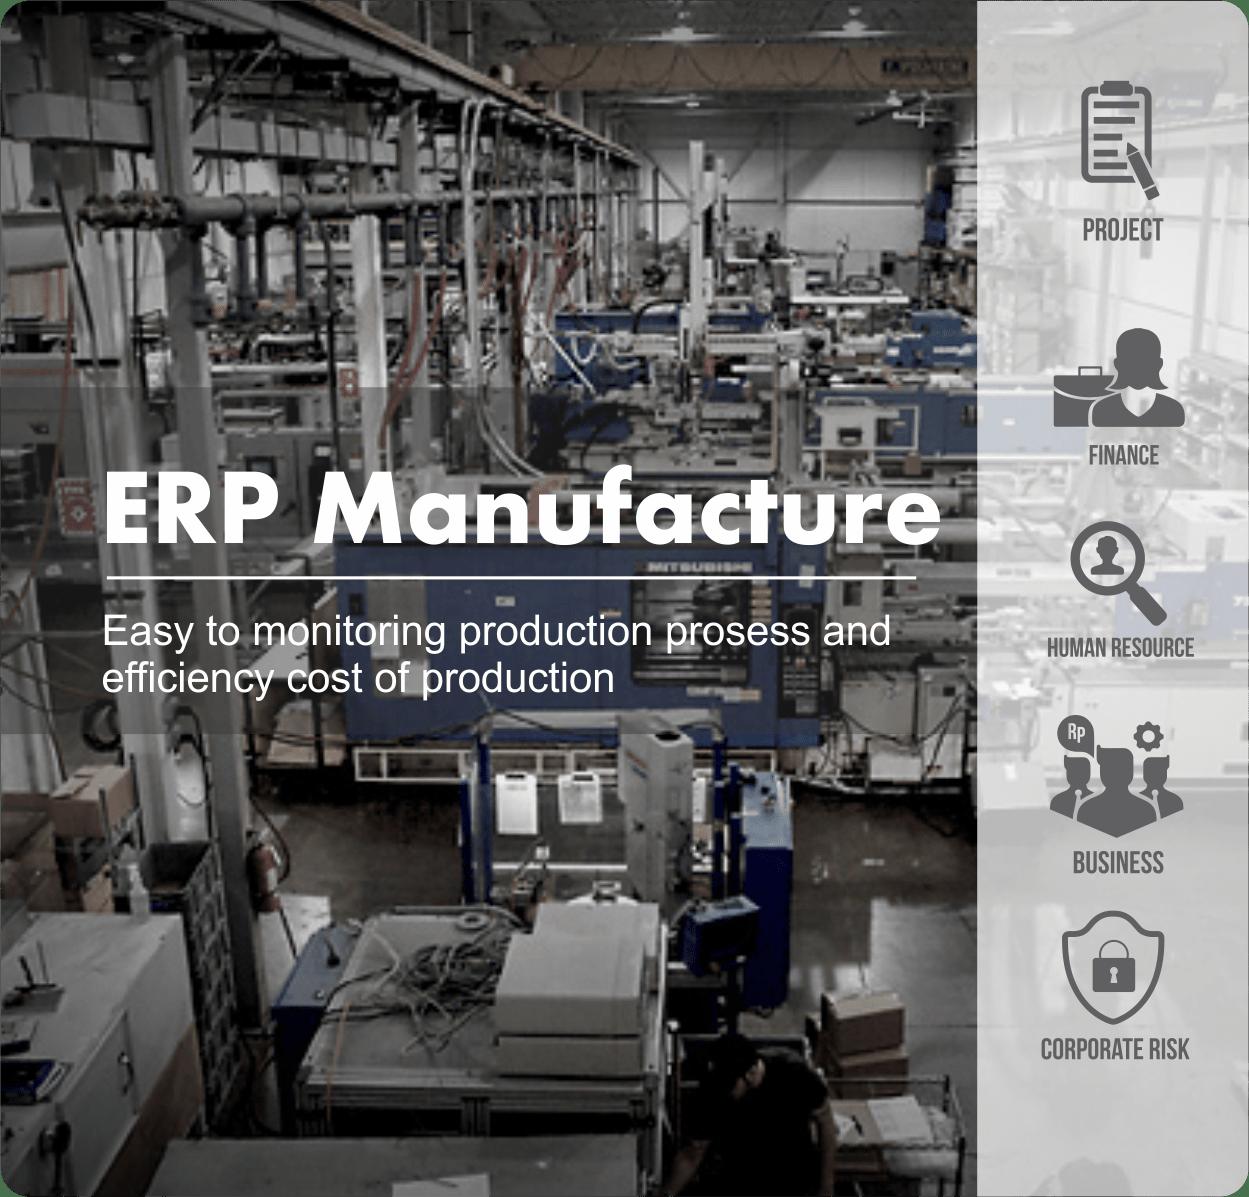 Folarium Integrated Custome Enterprise System